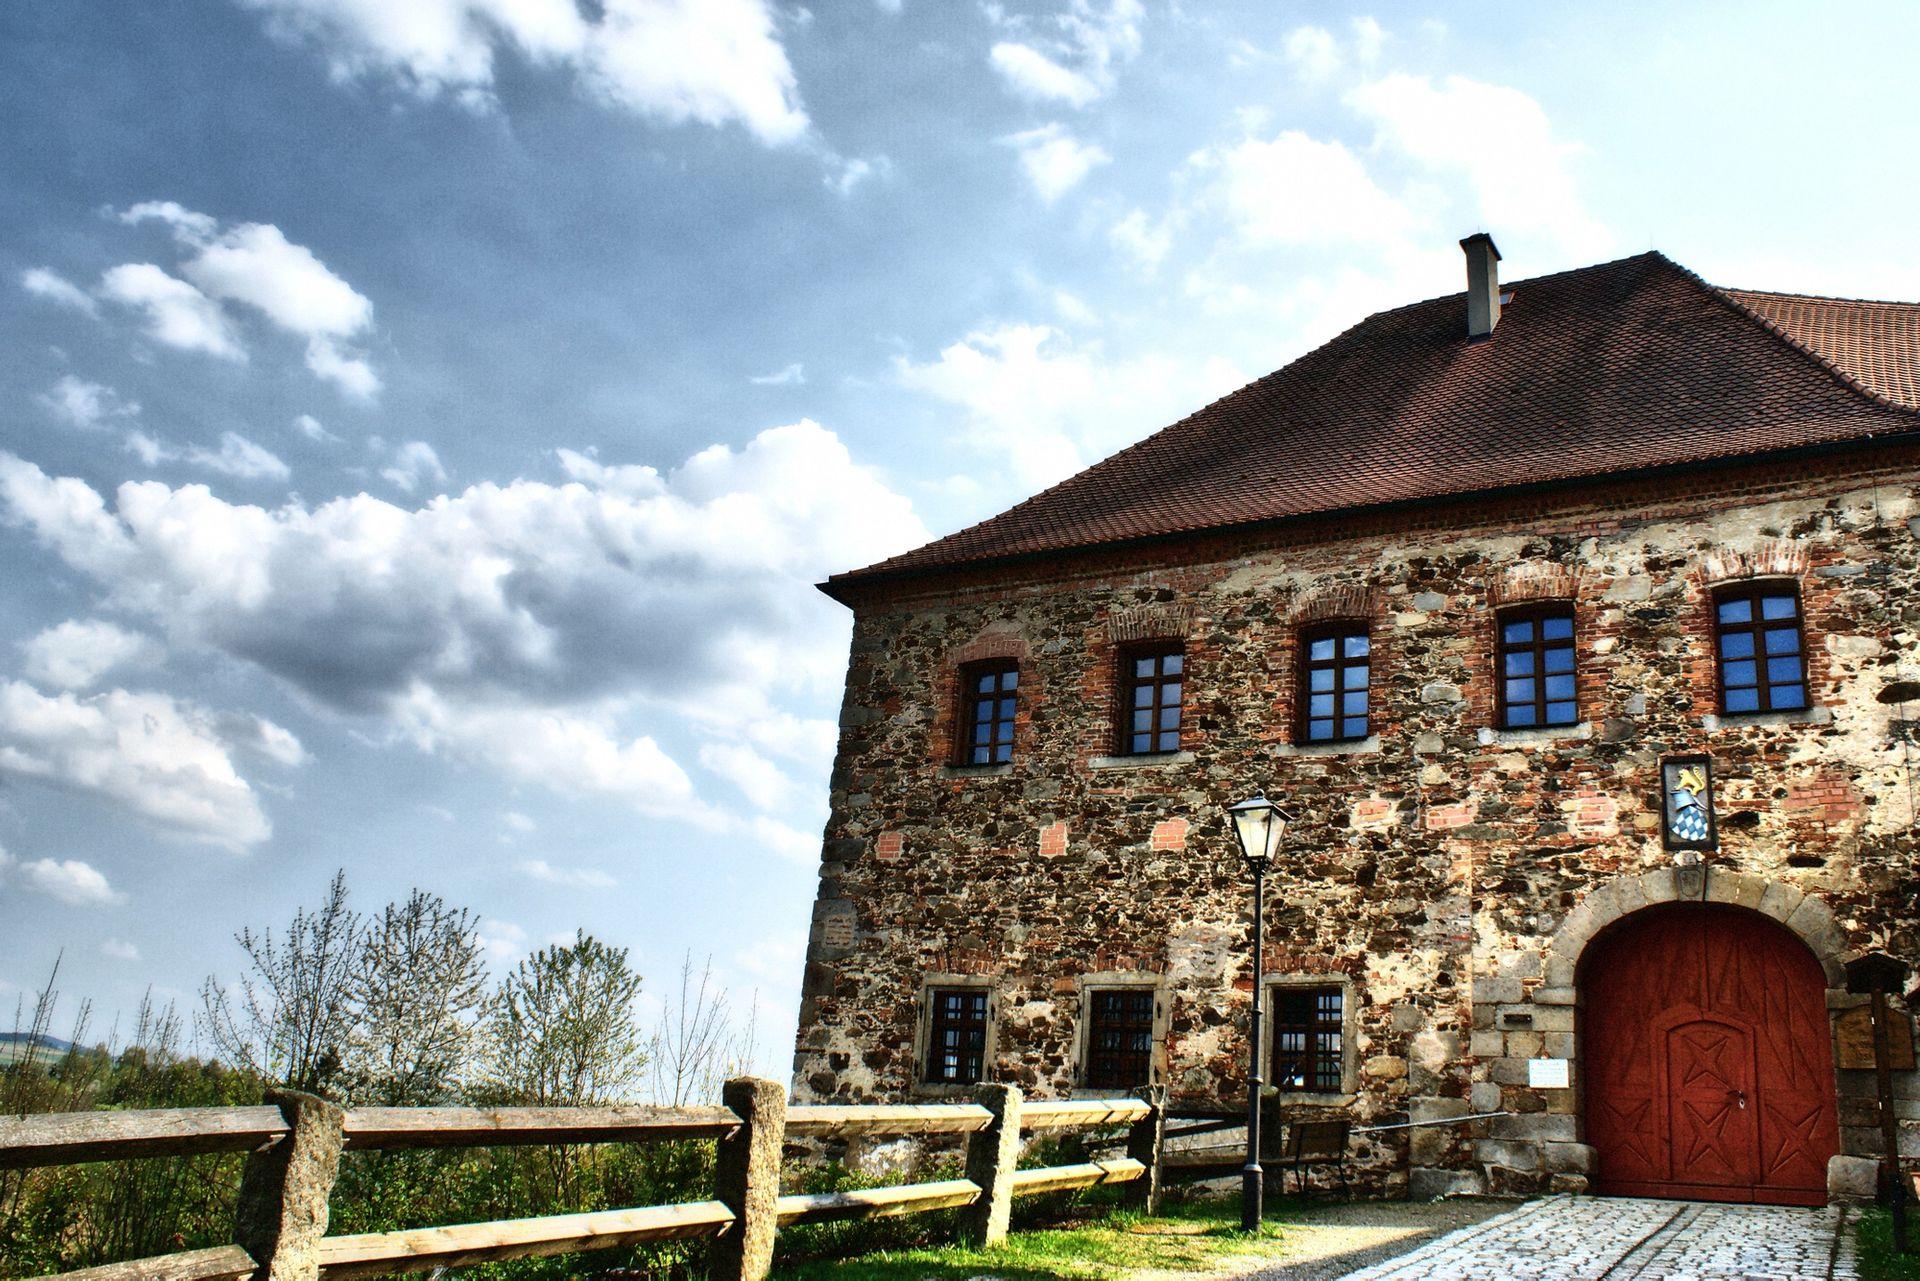 Anticimex Kammerjäger in Mosbach